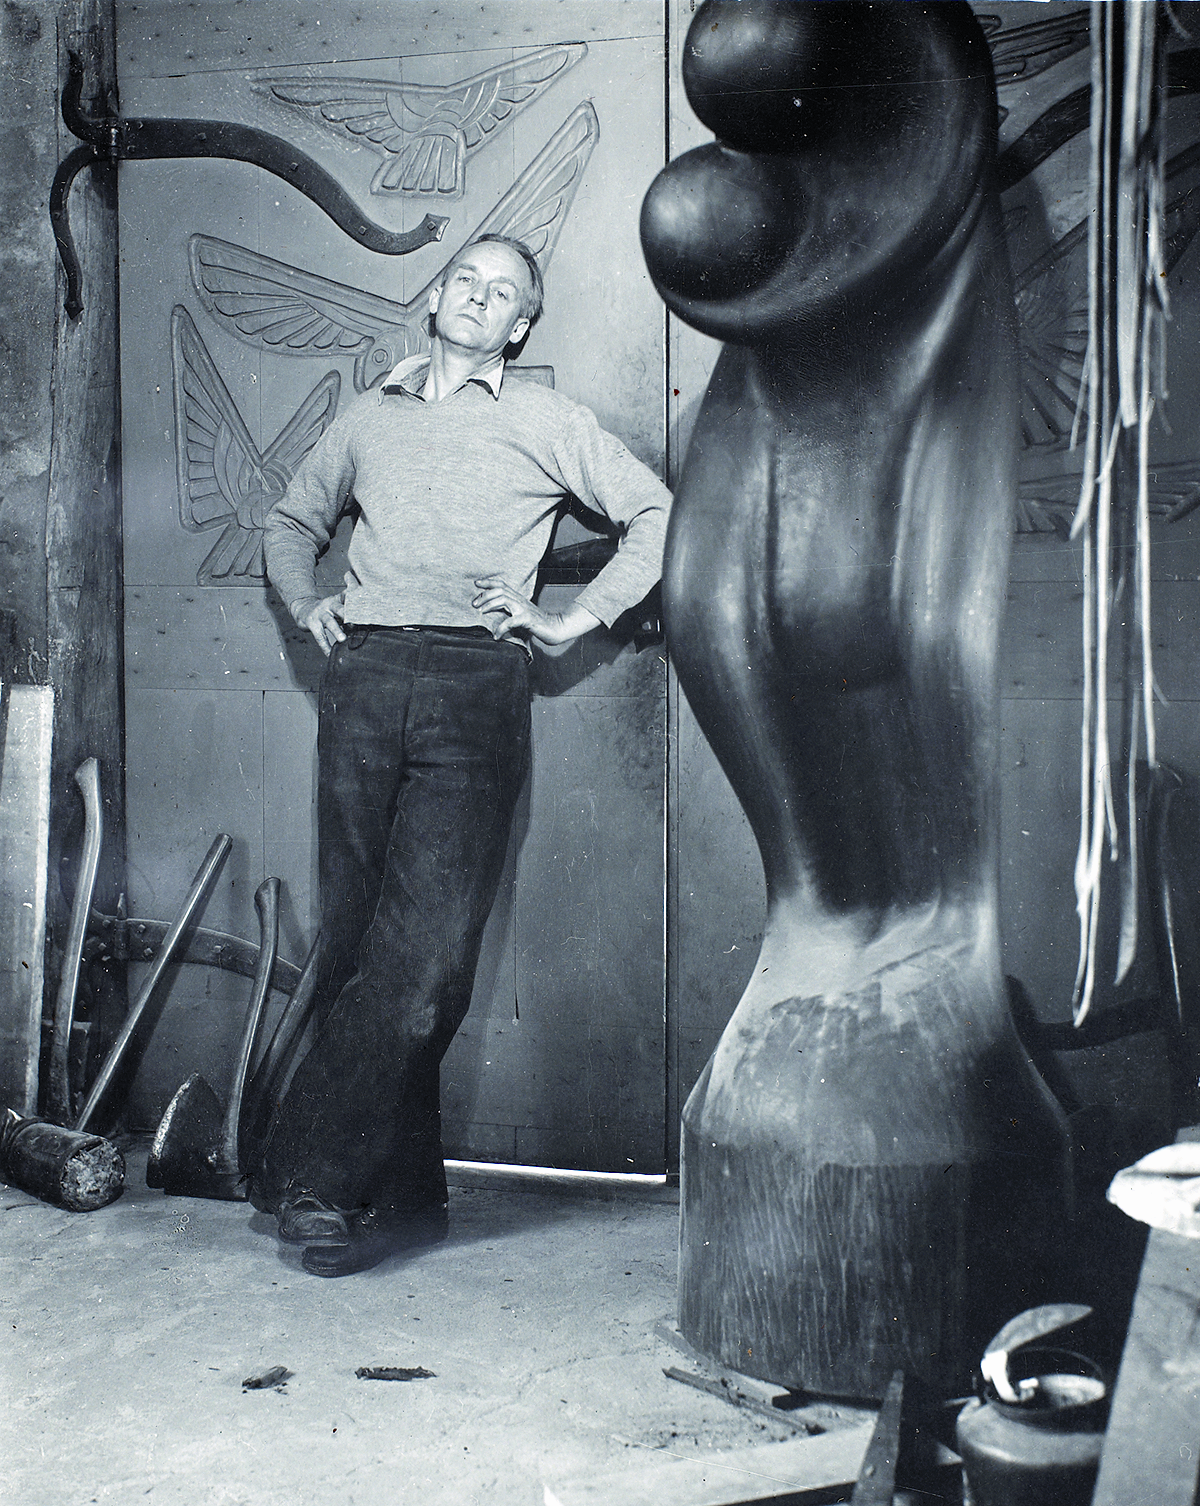 Wharton Esherick, 1940